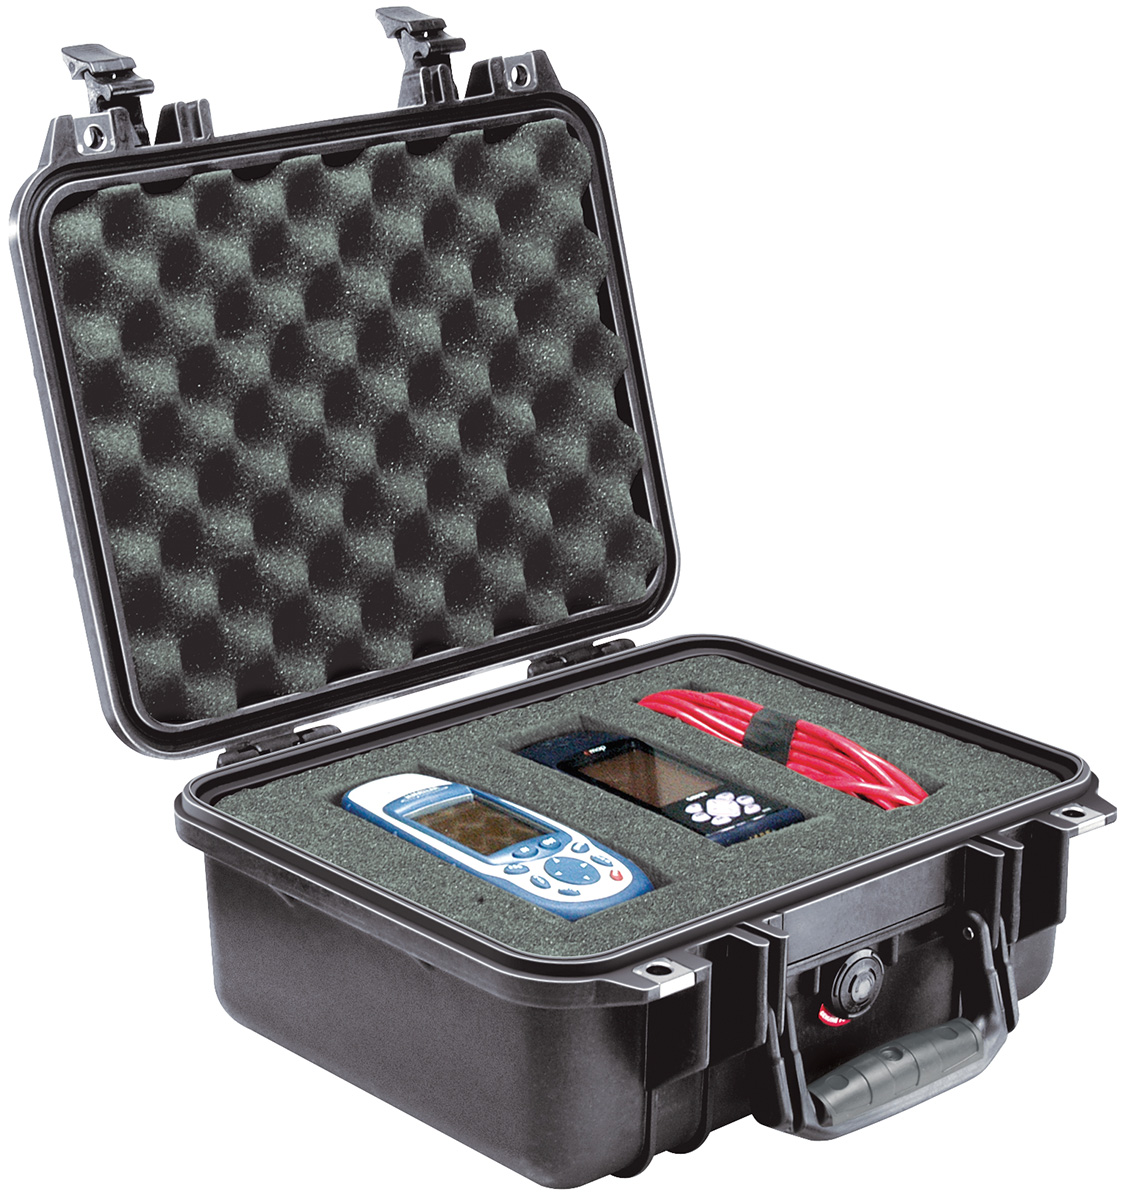 pelican crush water proof electronics case